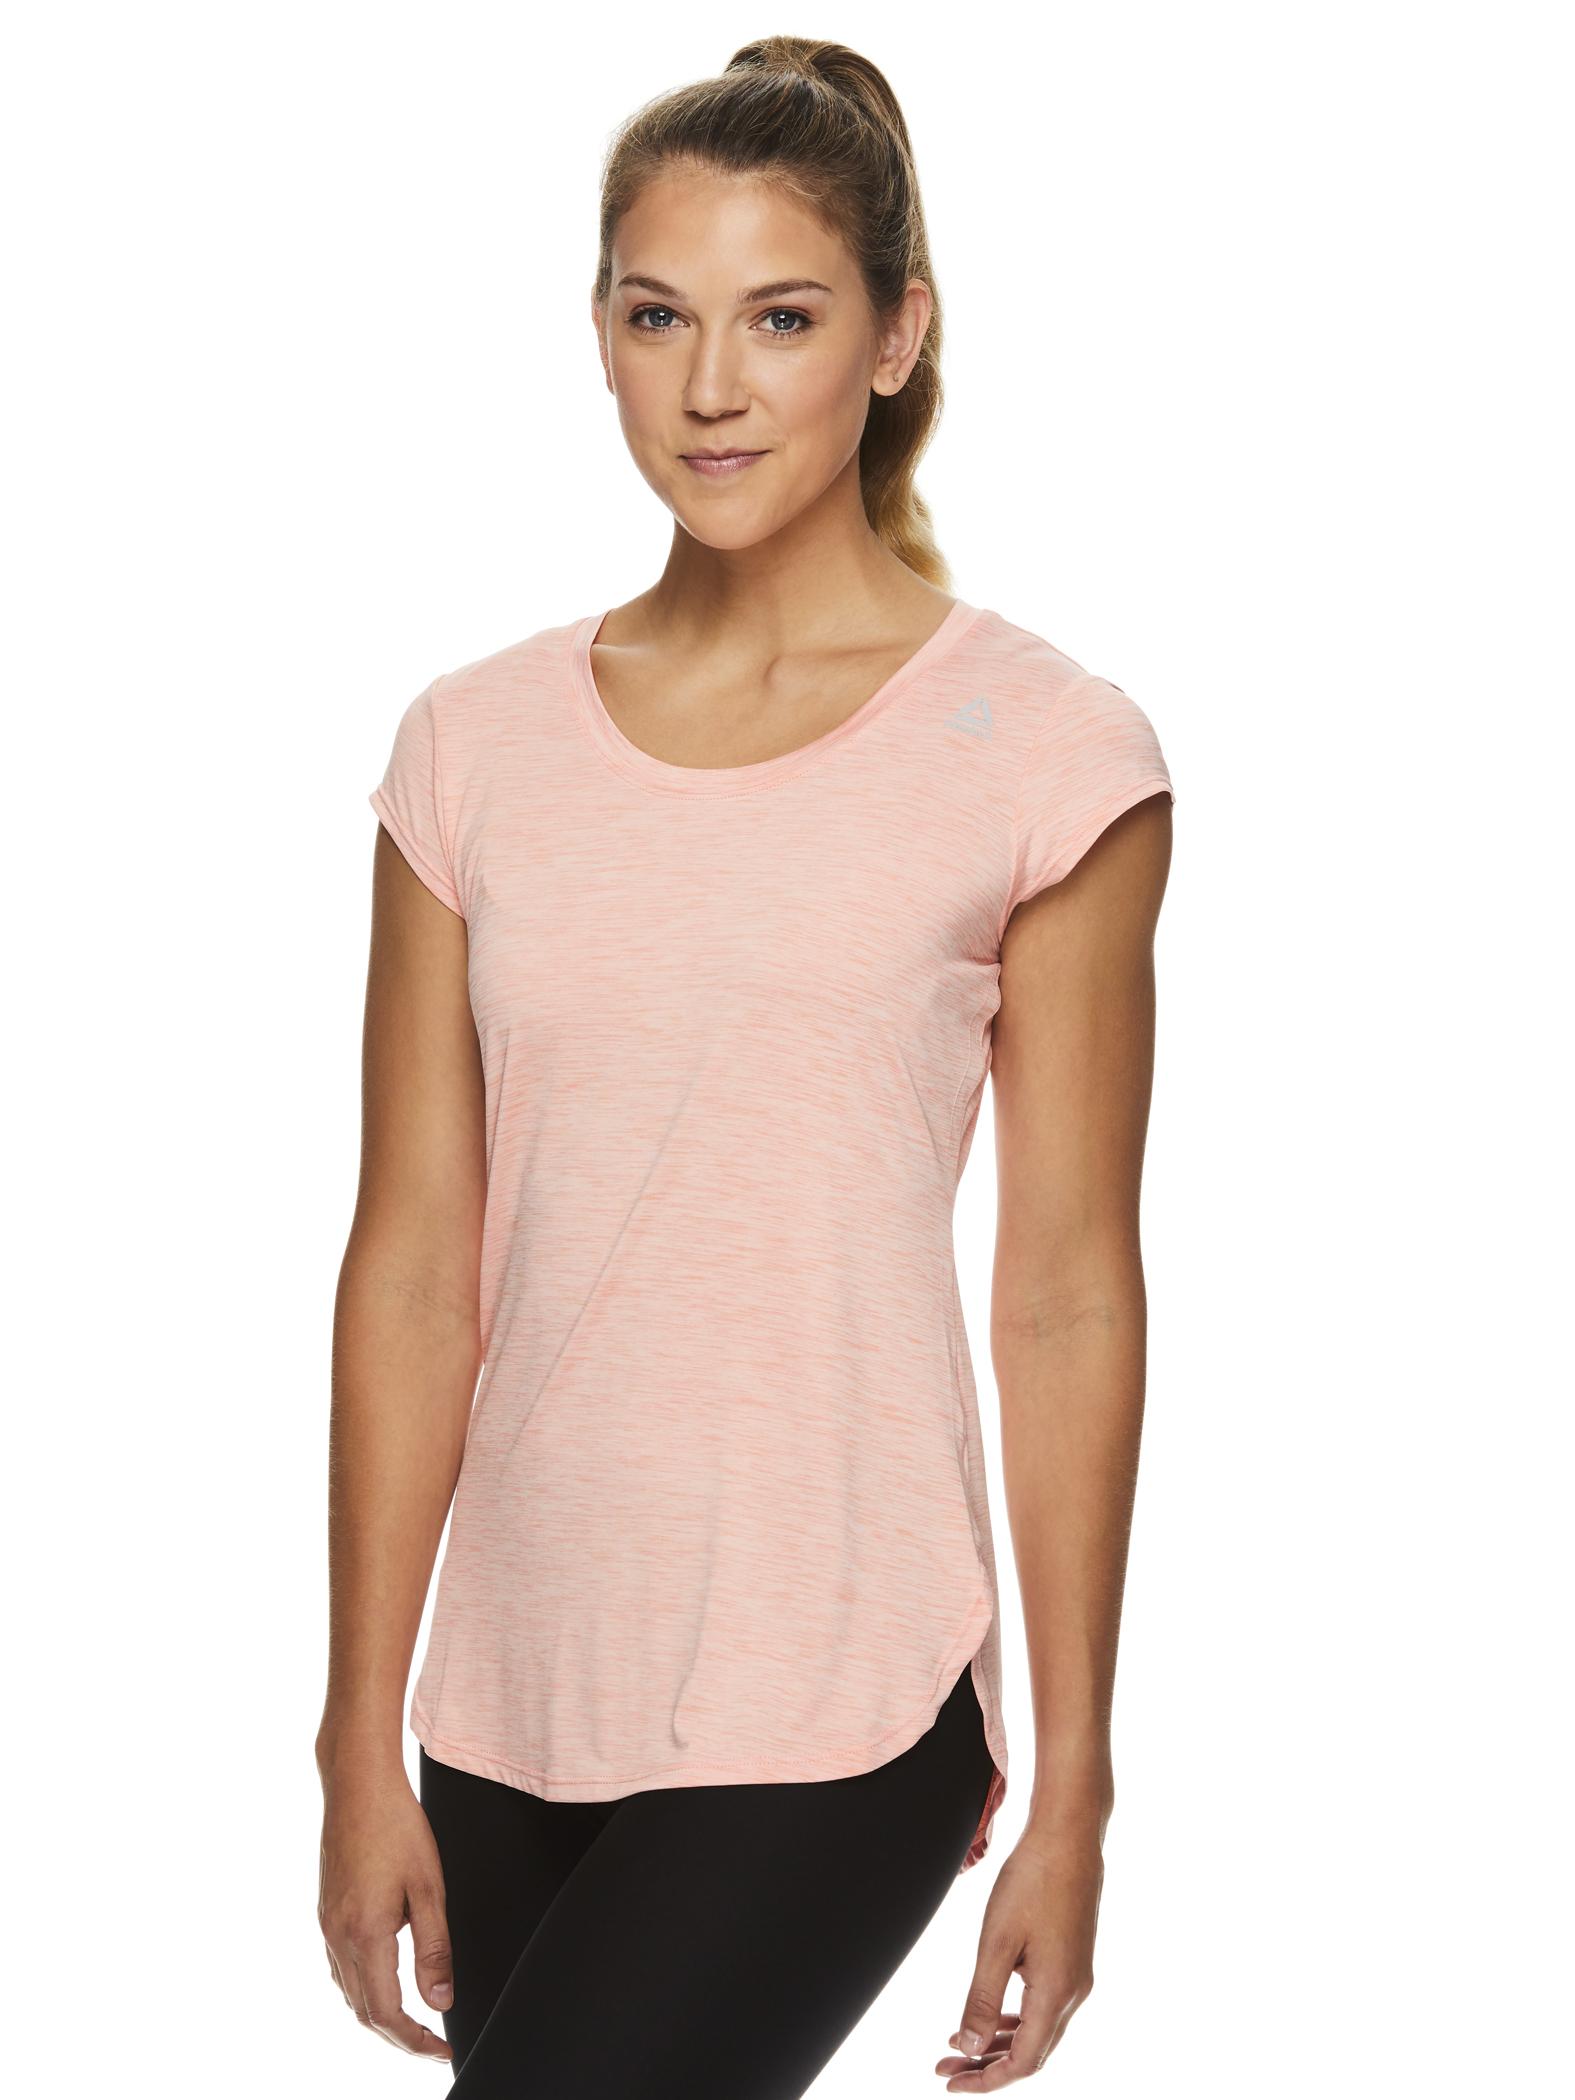 Reebok Women/'s Legend Performance Linear Marled Jersey T-Shirt Coral Heather L